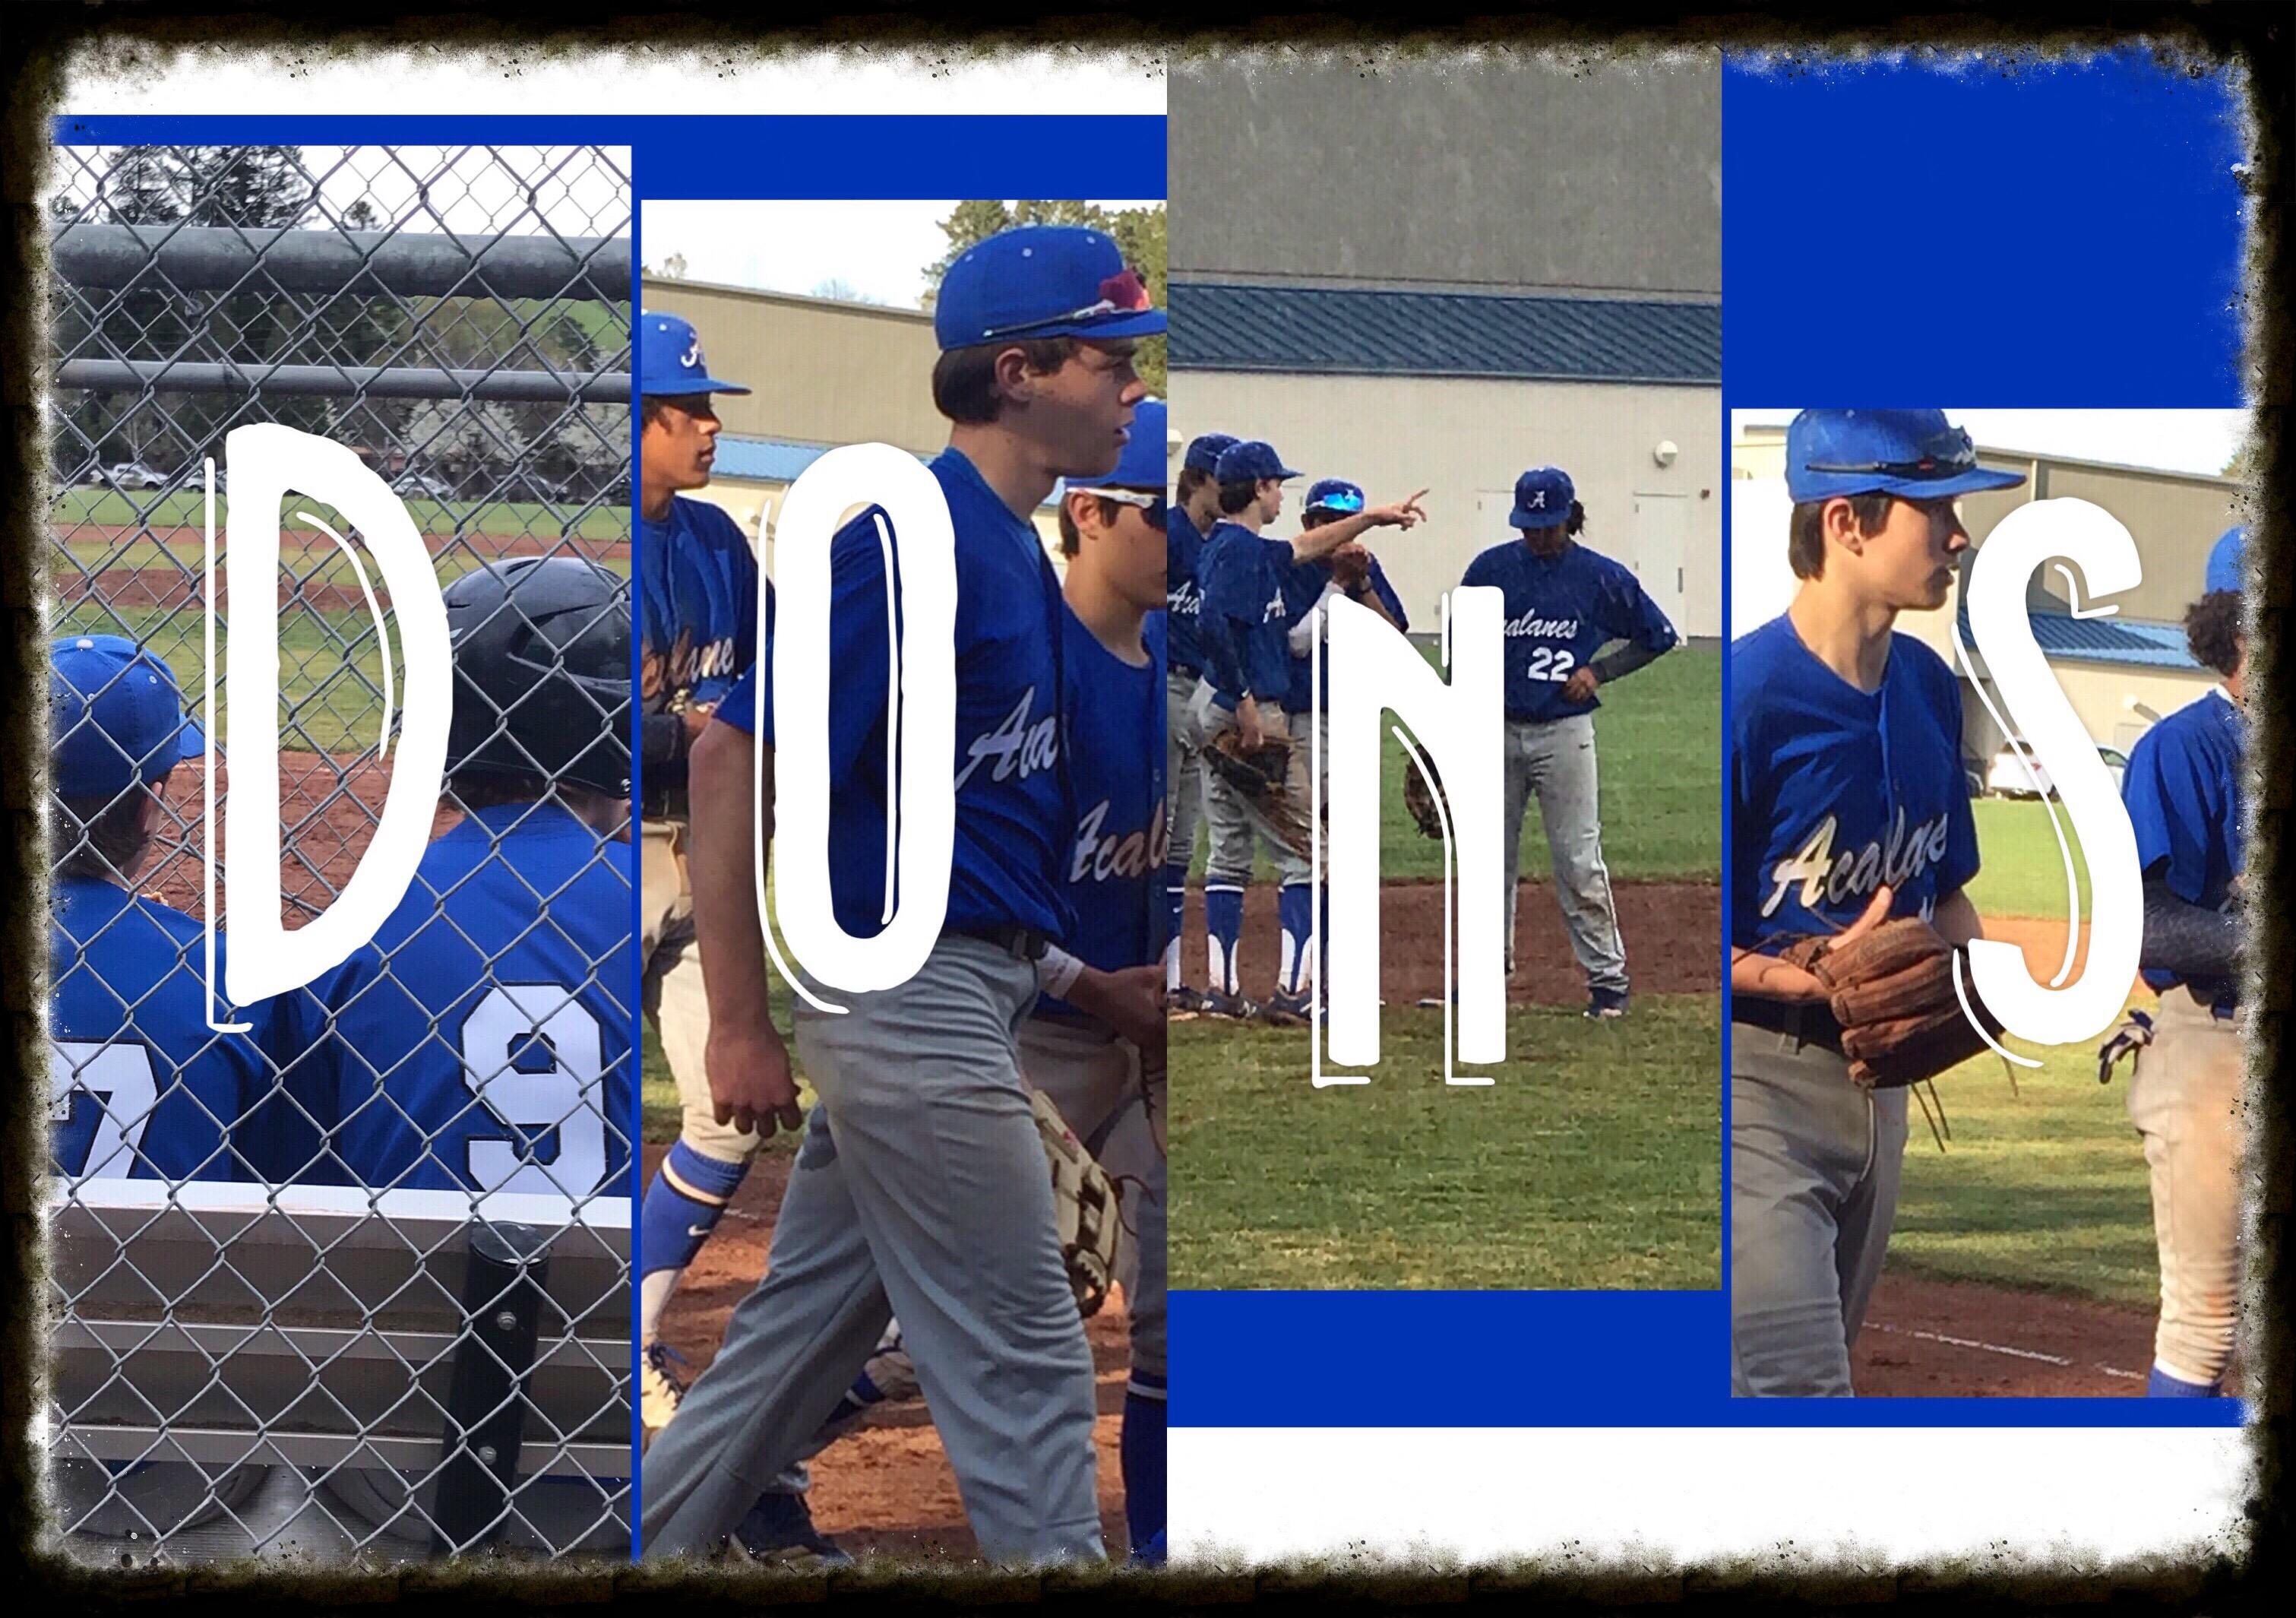 BLUE-tiful  Baseball Day for Frosh Dons in Moraga